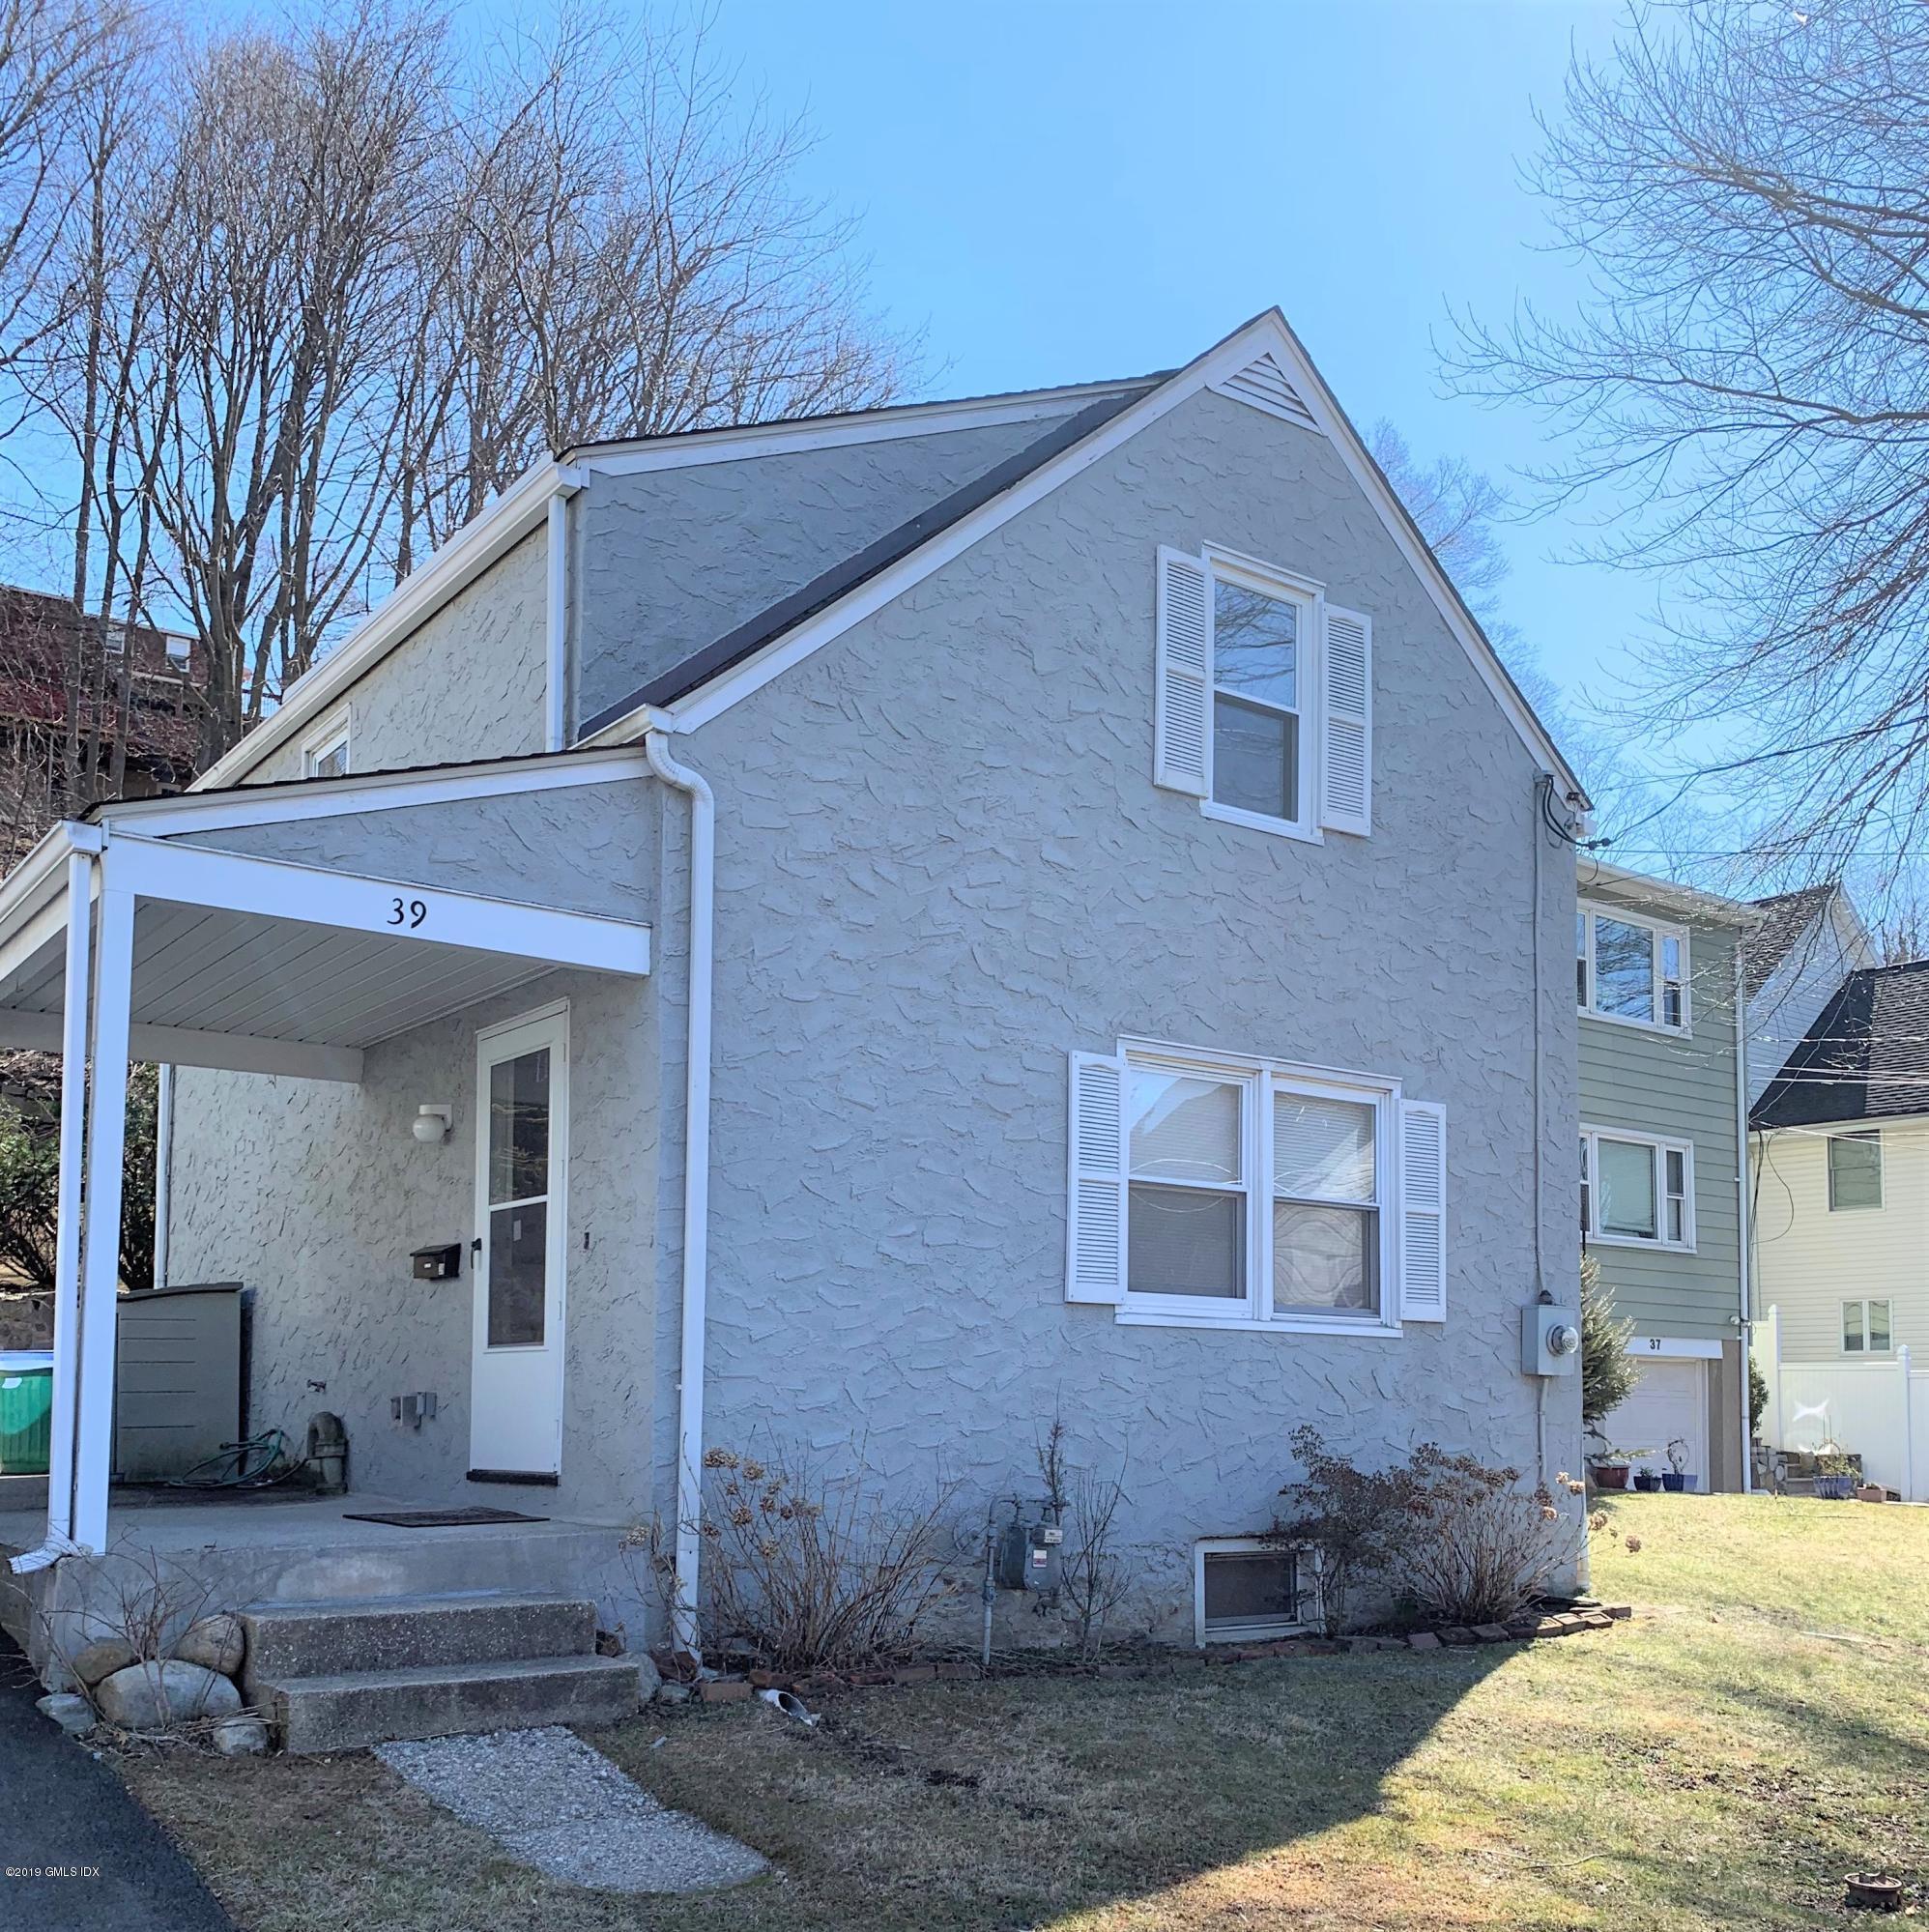 39 Pemberwick Road,Greenwich,Connecticut 06831,2 Bedrooms Bedrooms,1 BathroomBathrooms,Single family,Pemberwick,105850